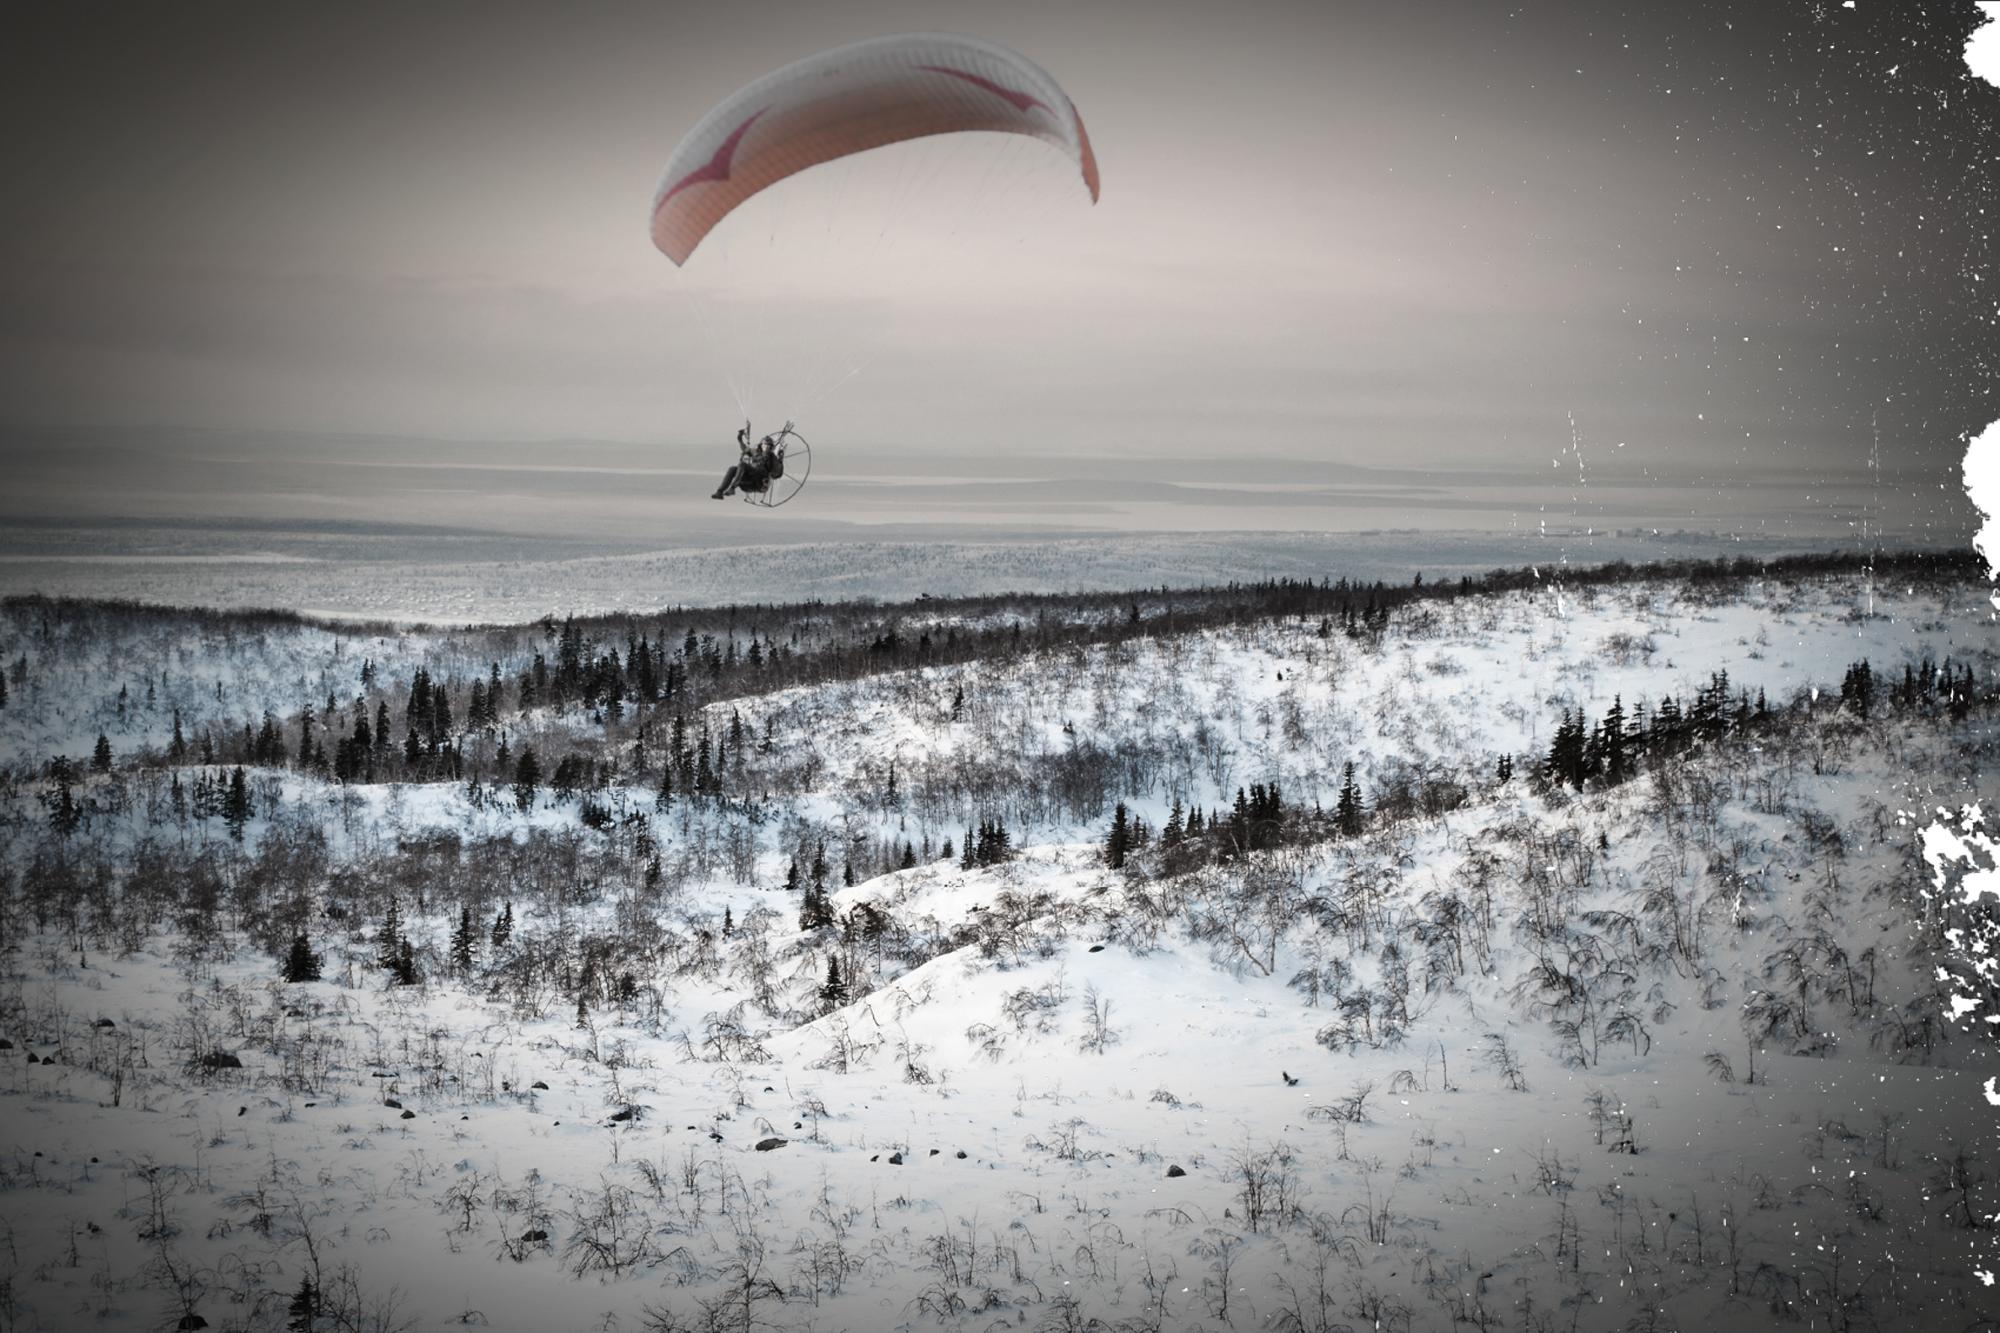 Sacha over tundra landscape